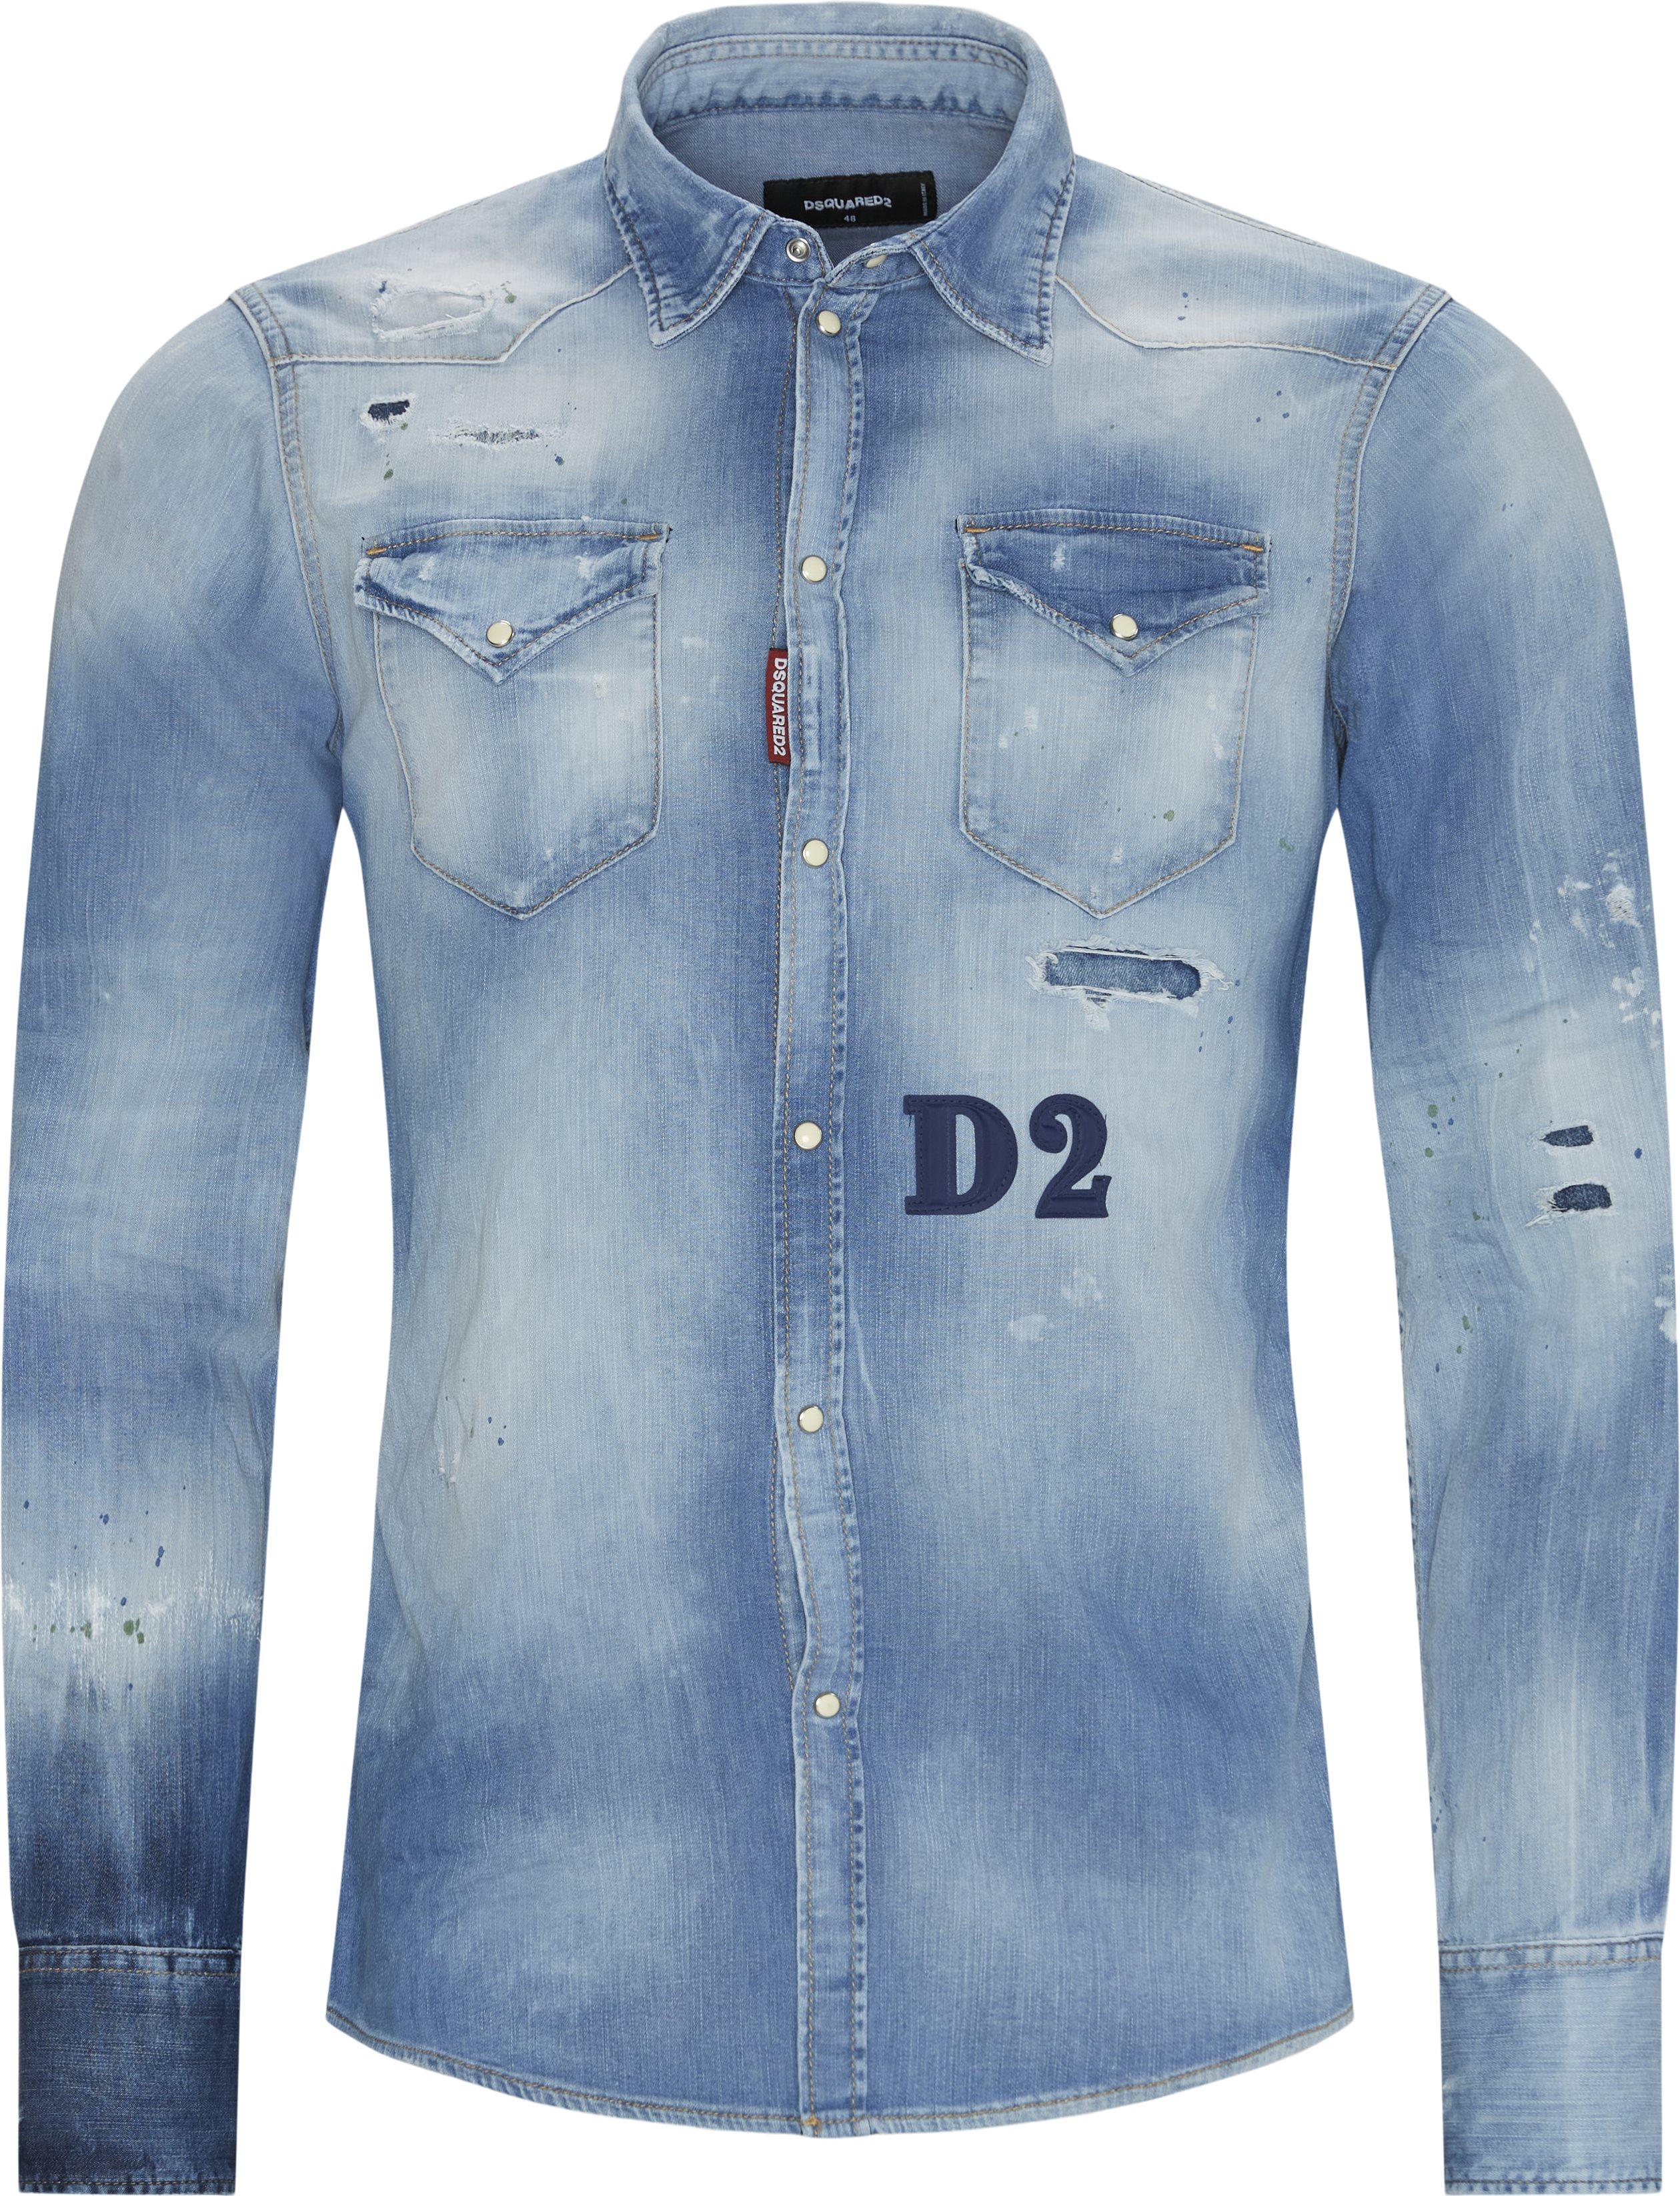 Shirts - Regular fit - Blue